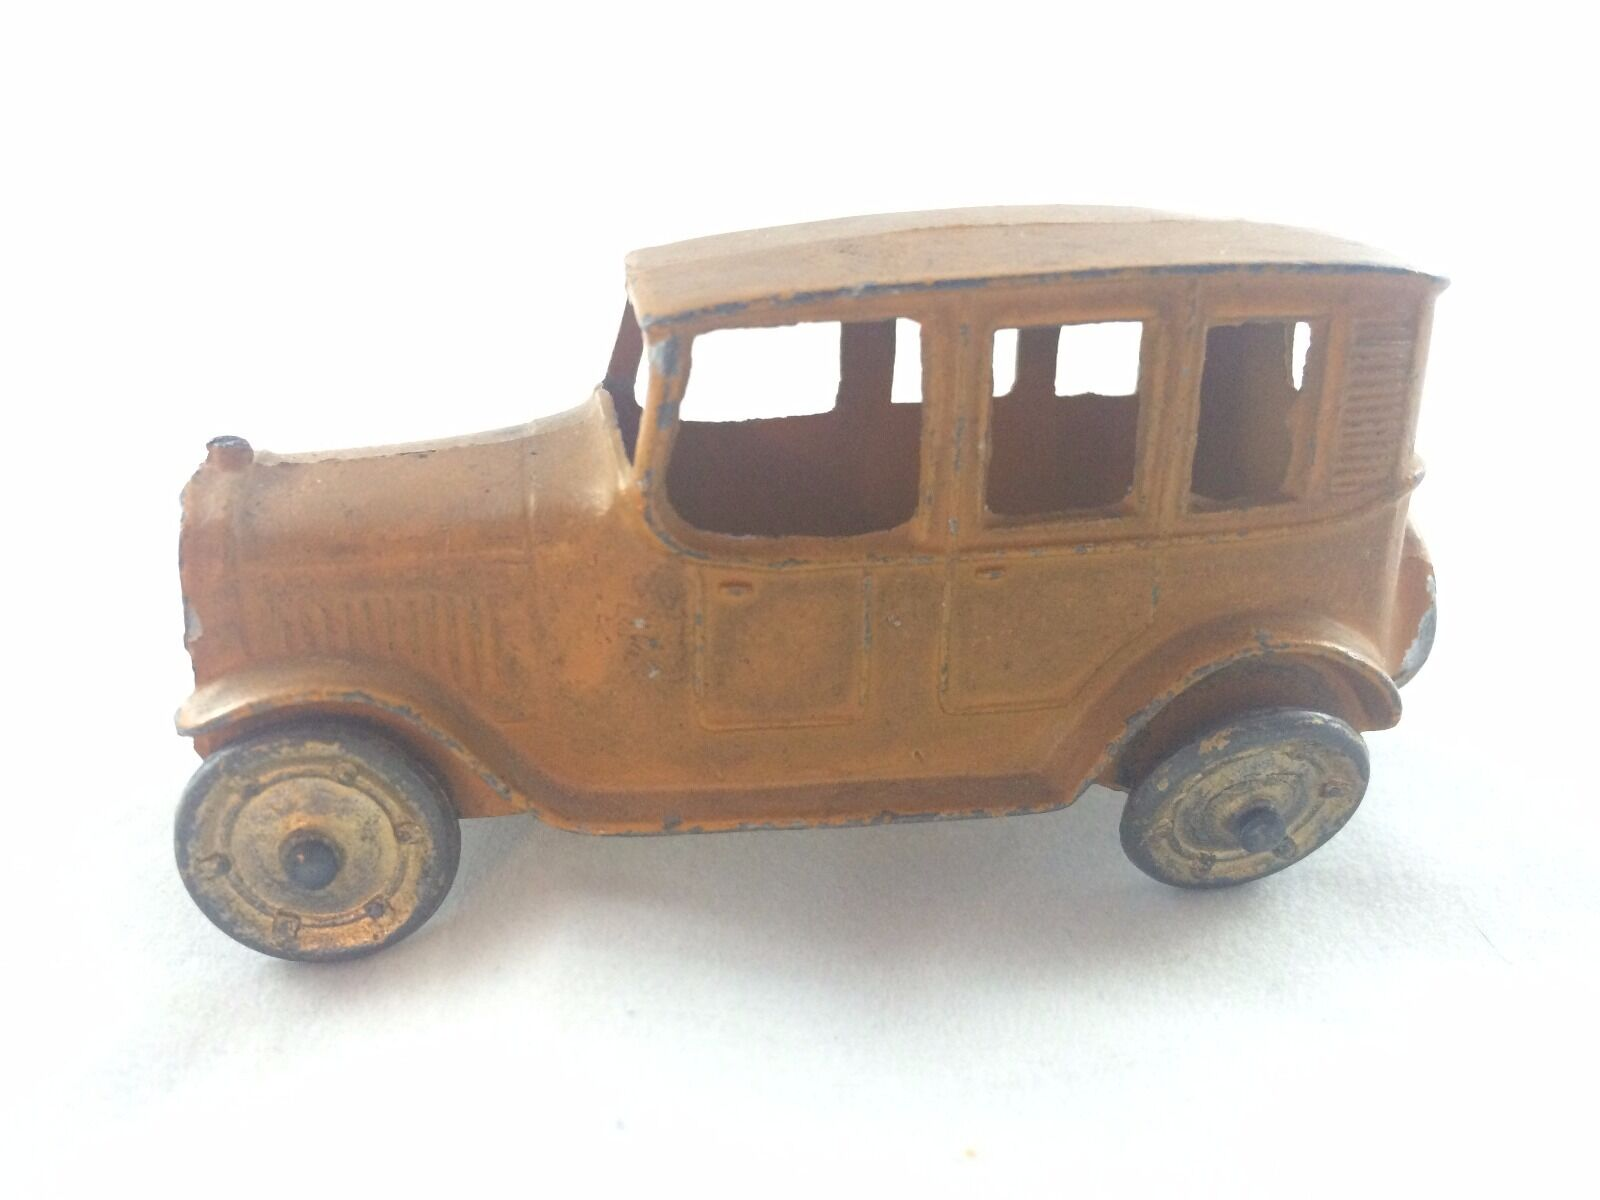 TootsieToy 1920's Taxi Cab giallo Original Diecast